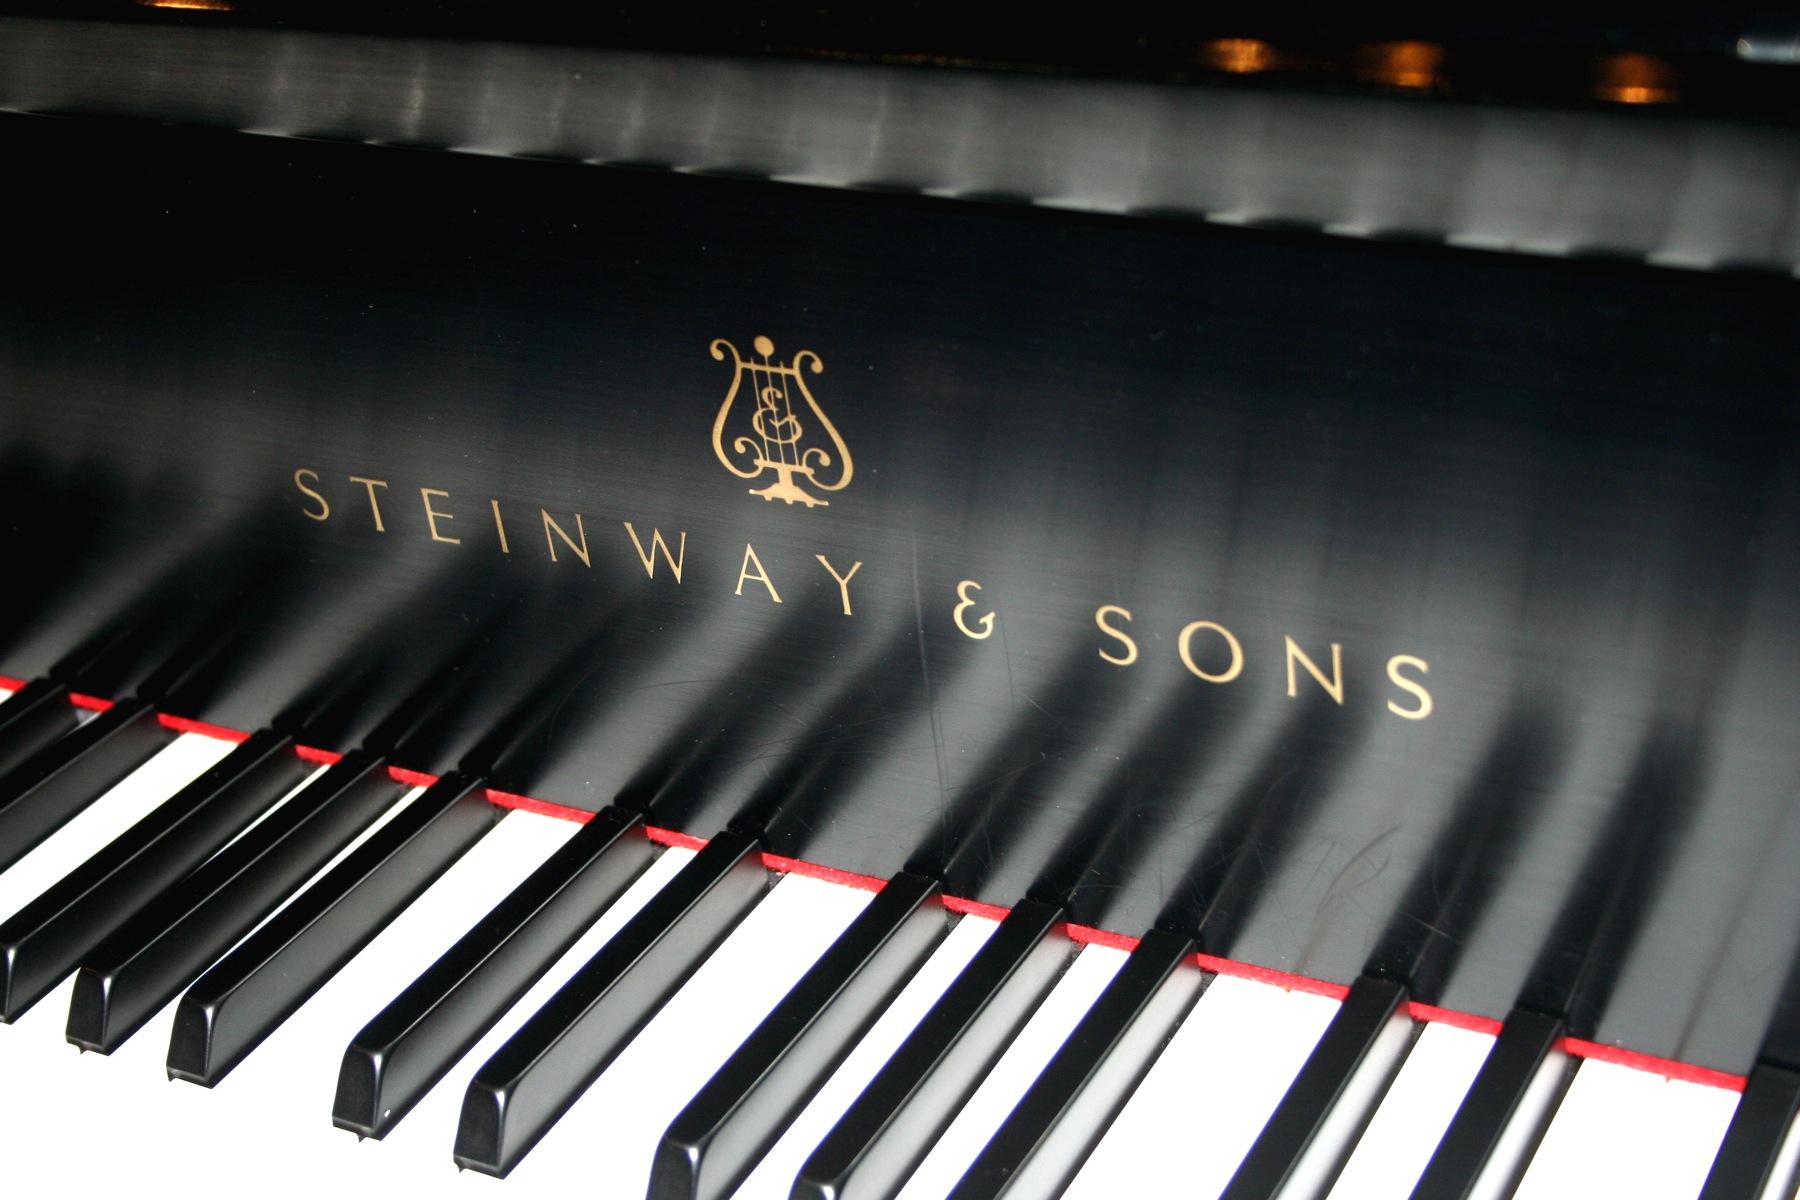 Steinway_&_Sons,_keys_and_modern_logo